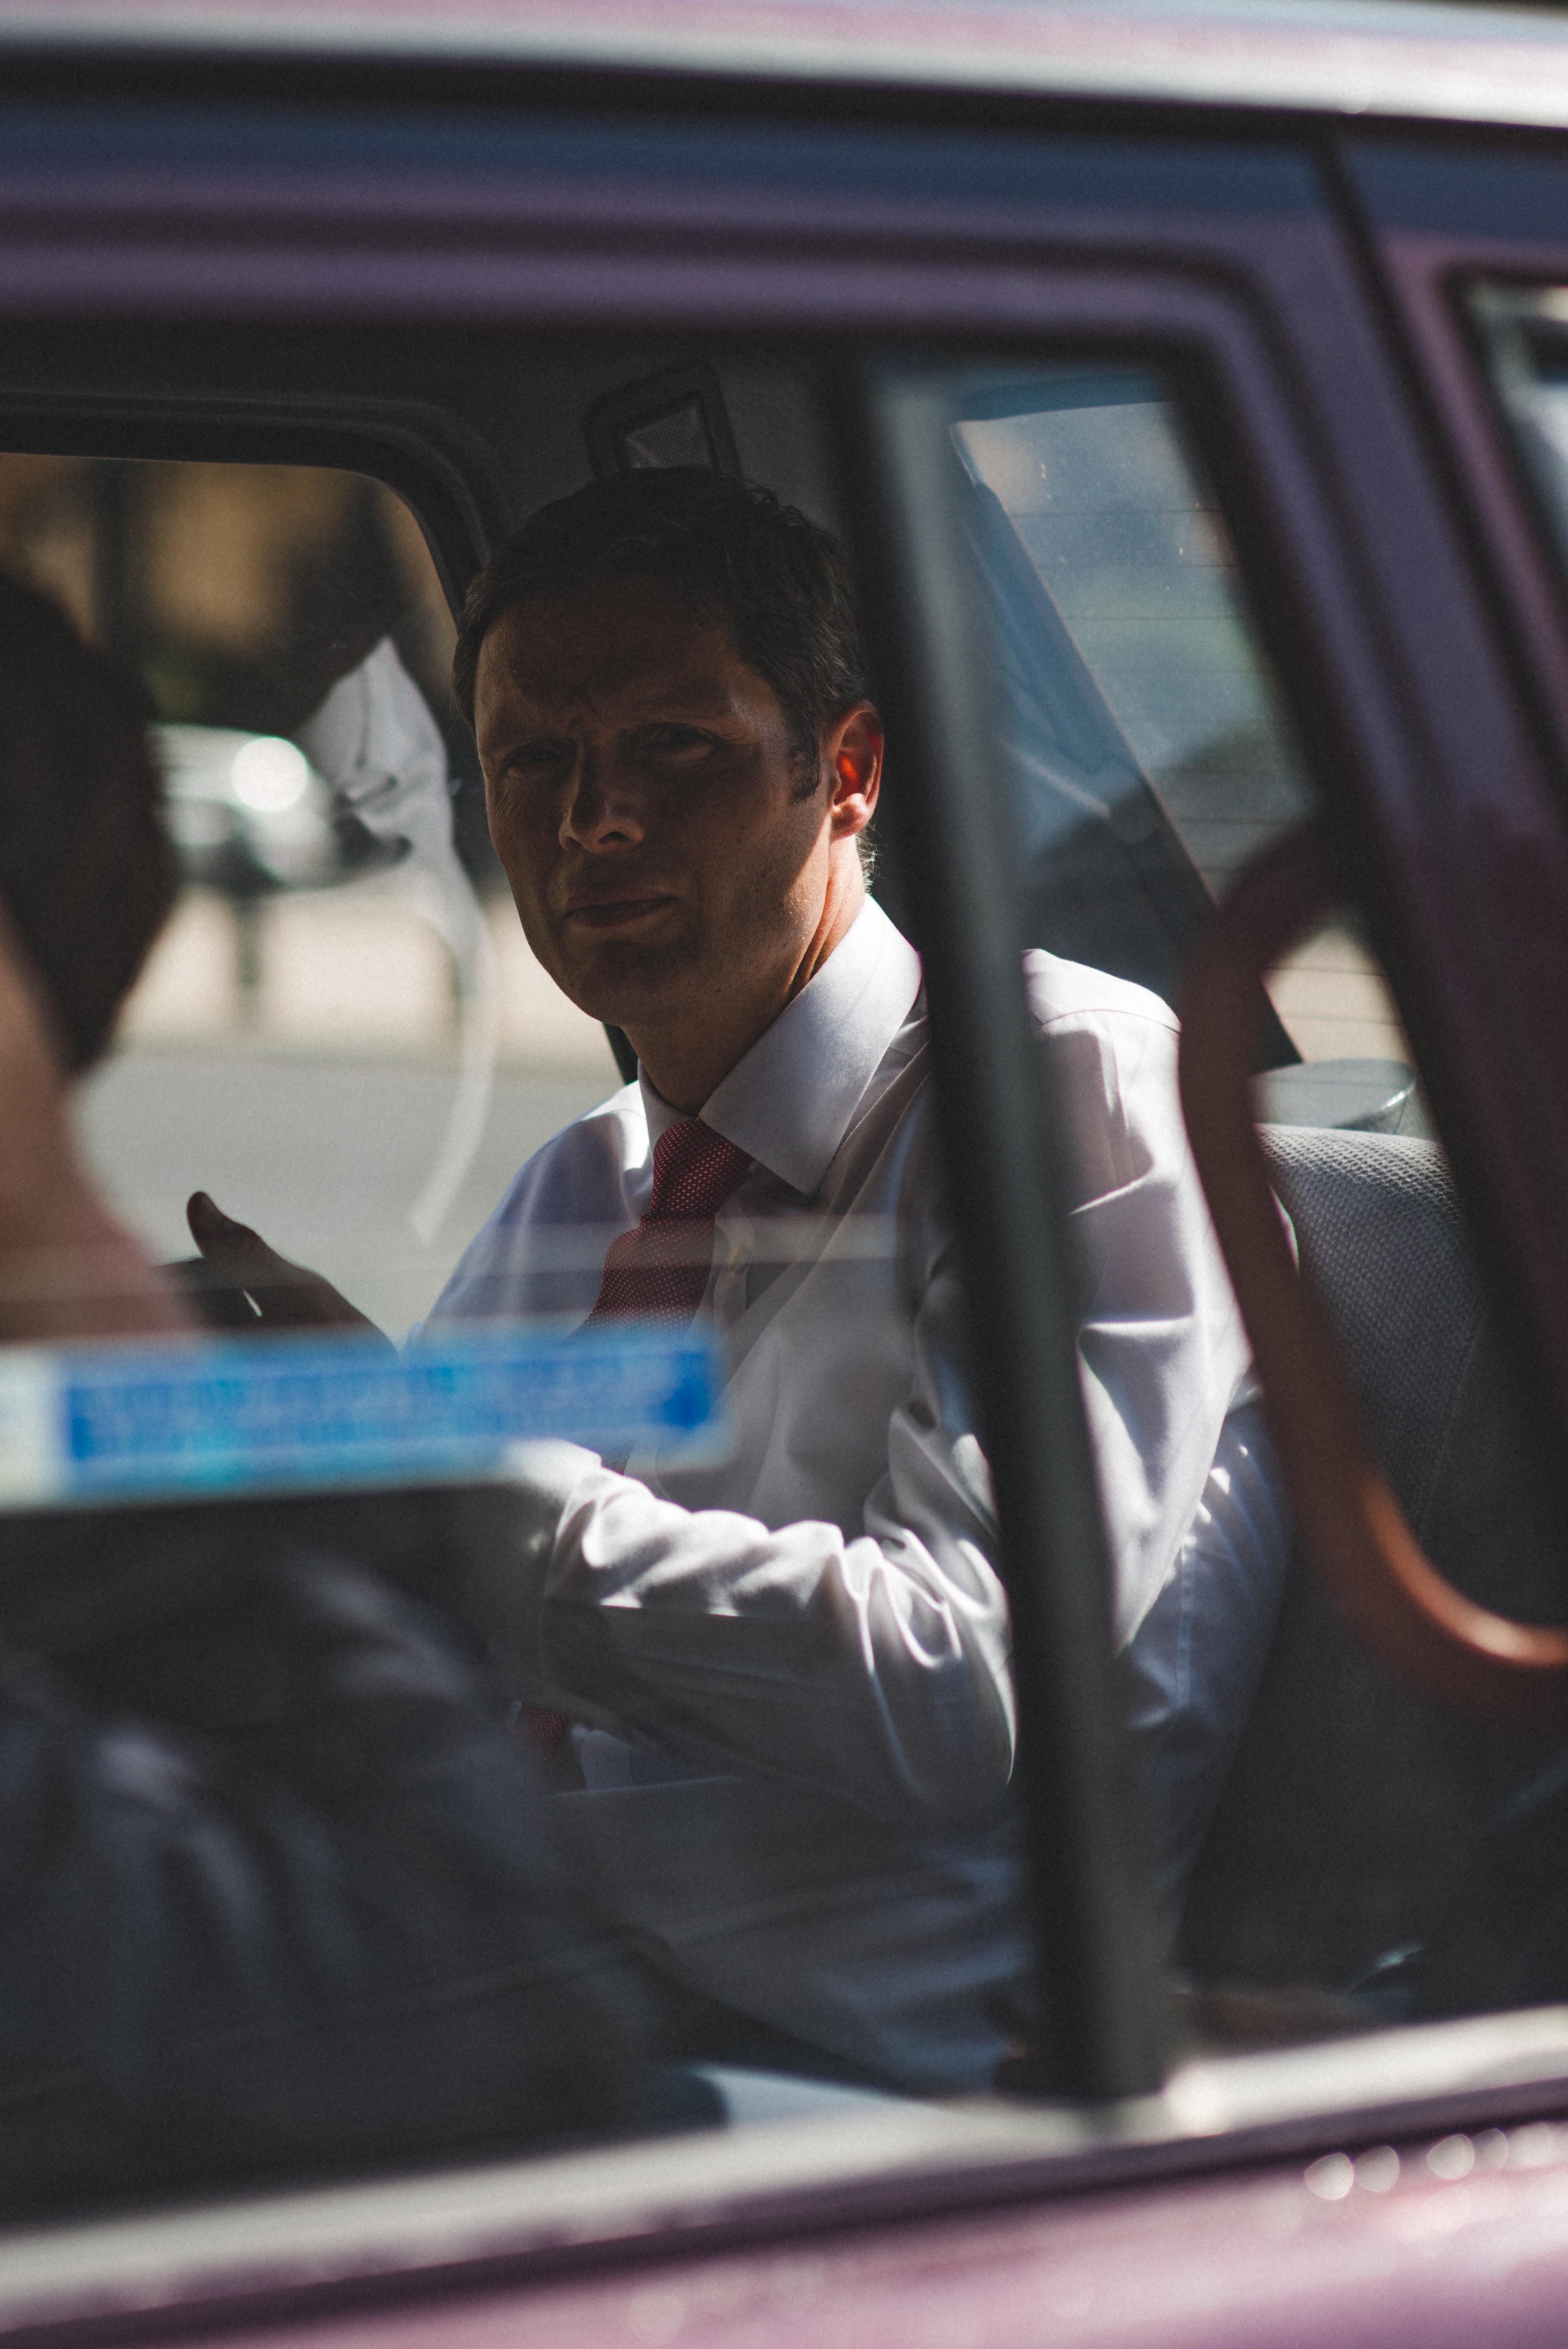 man in white dress shirt sitting inside vehicle